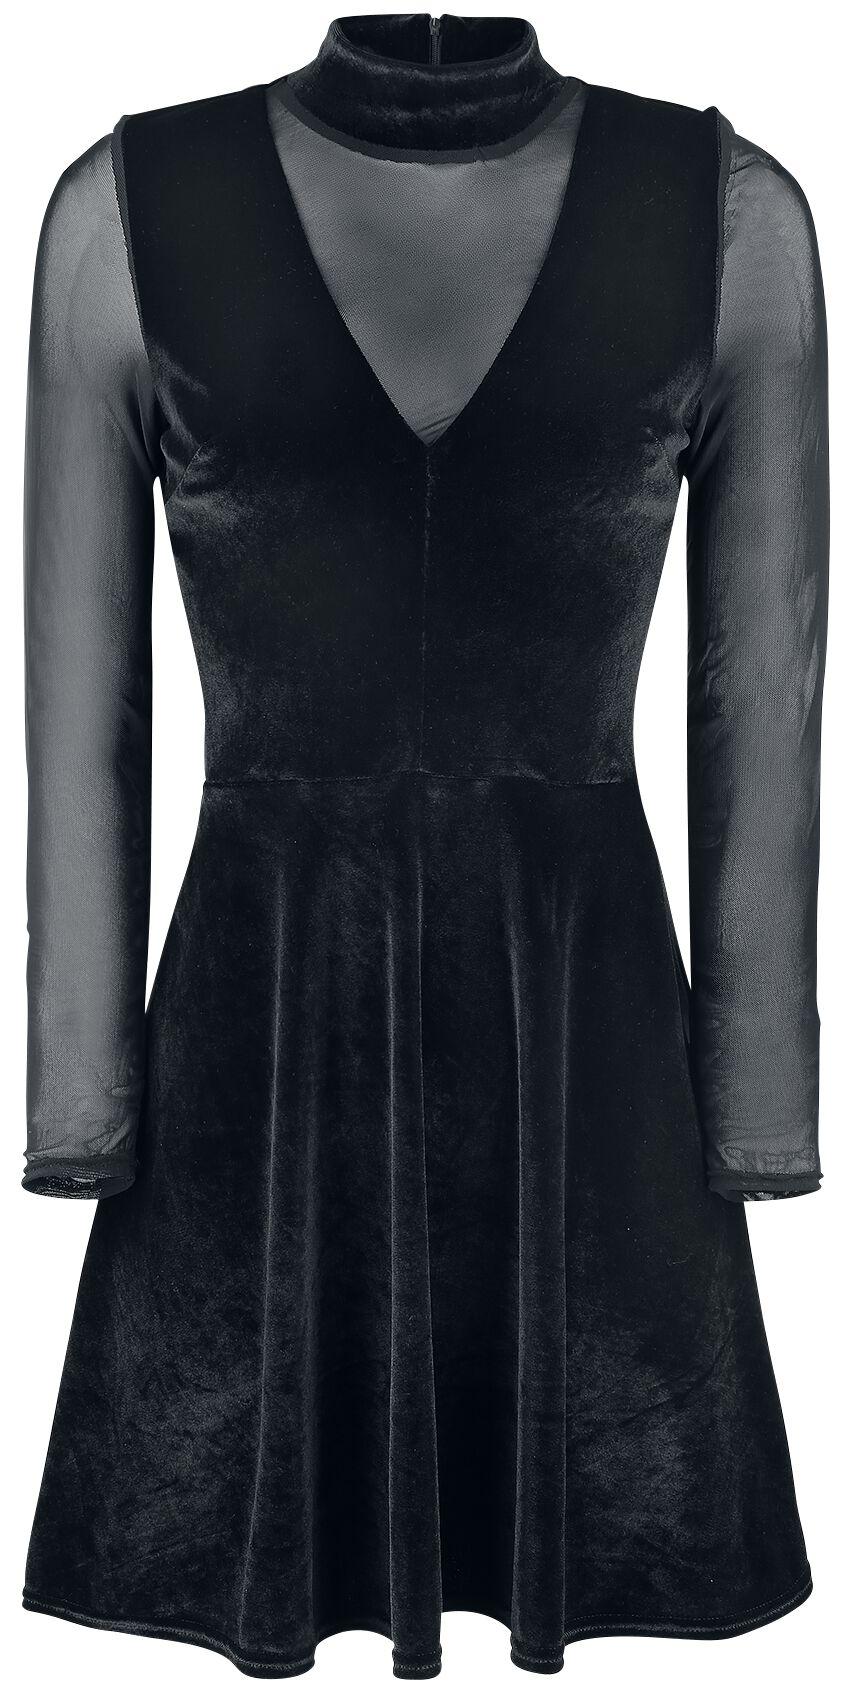 Fashion Victim Velvet Dress Kleid schwarz